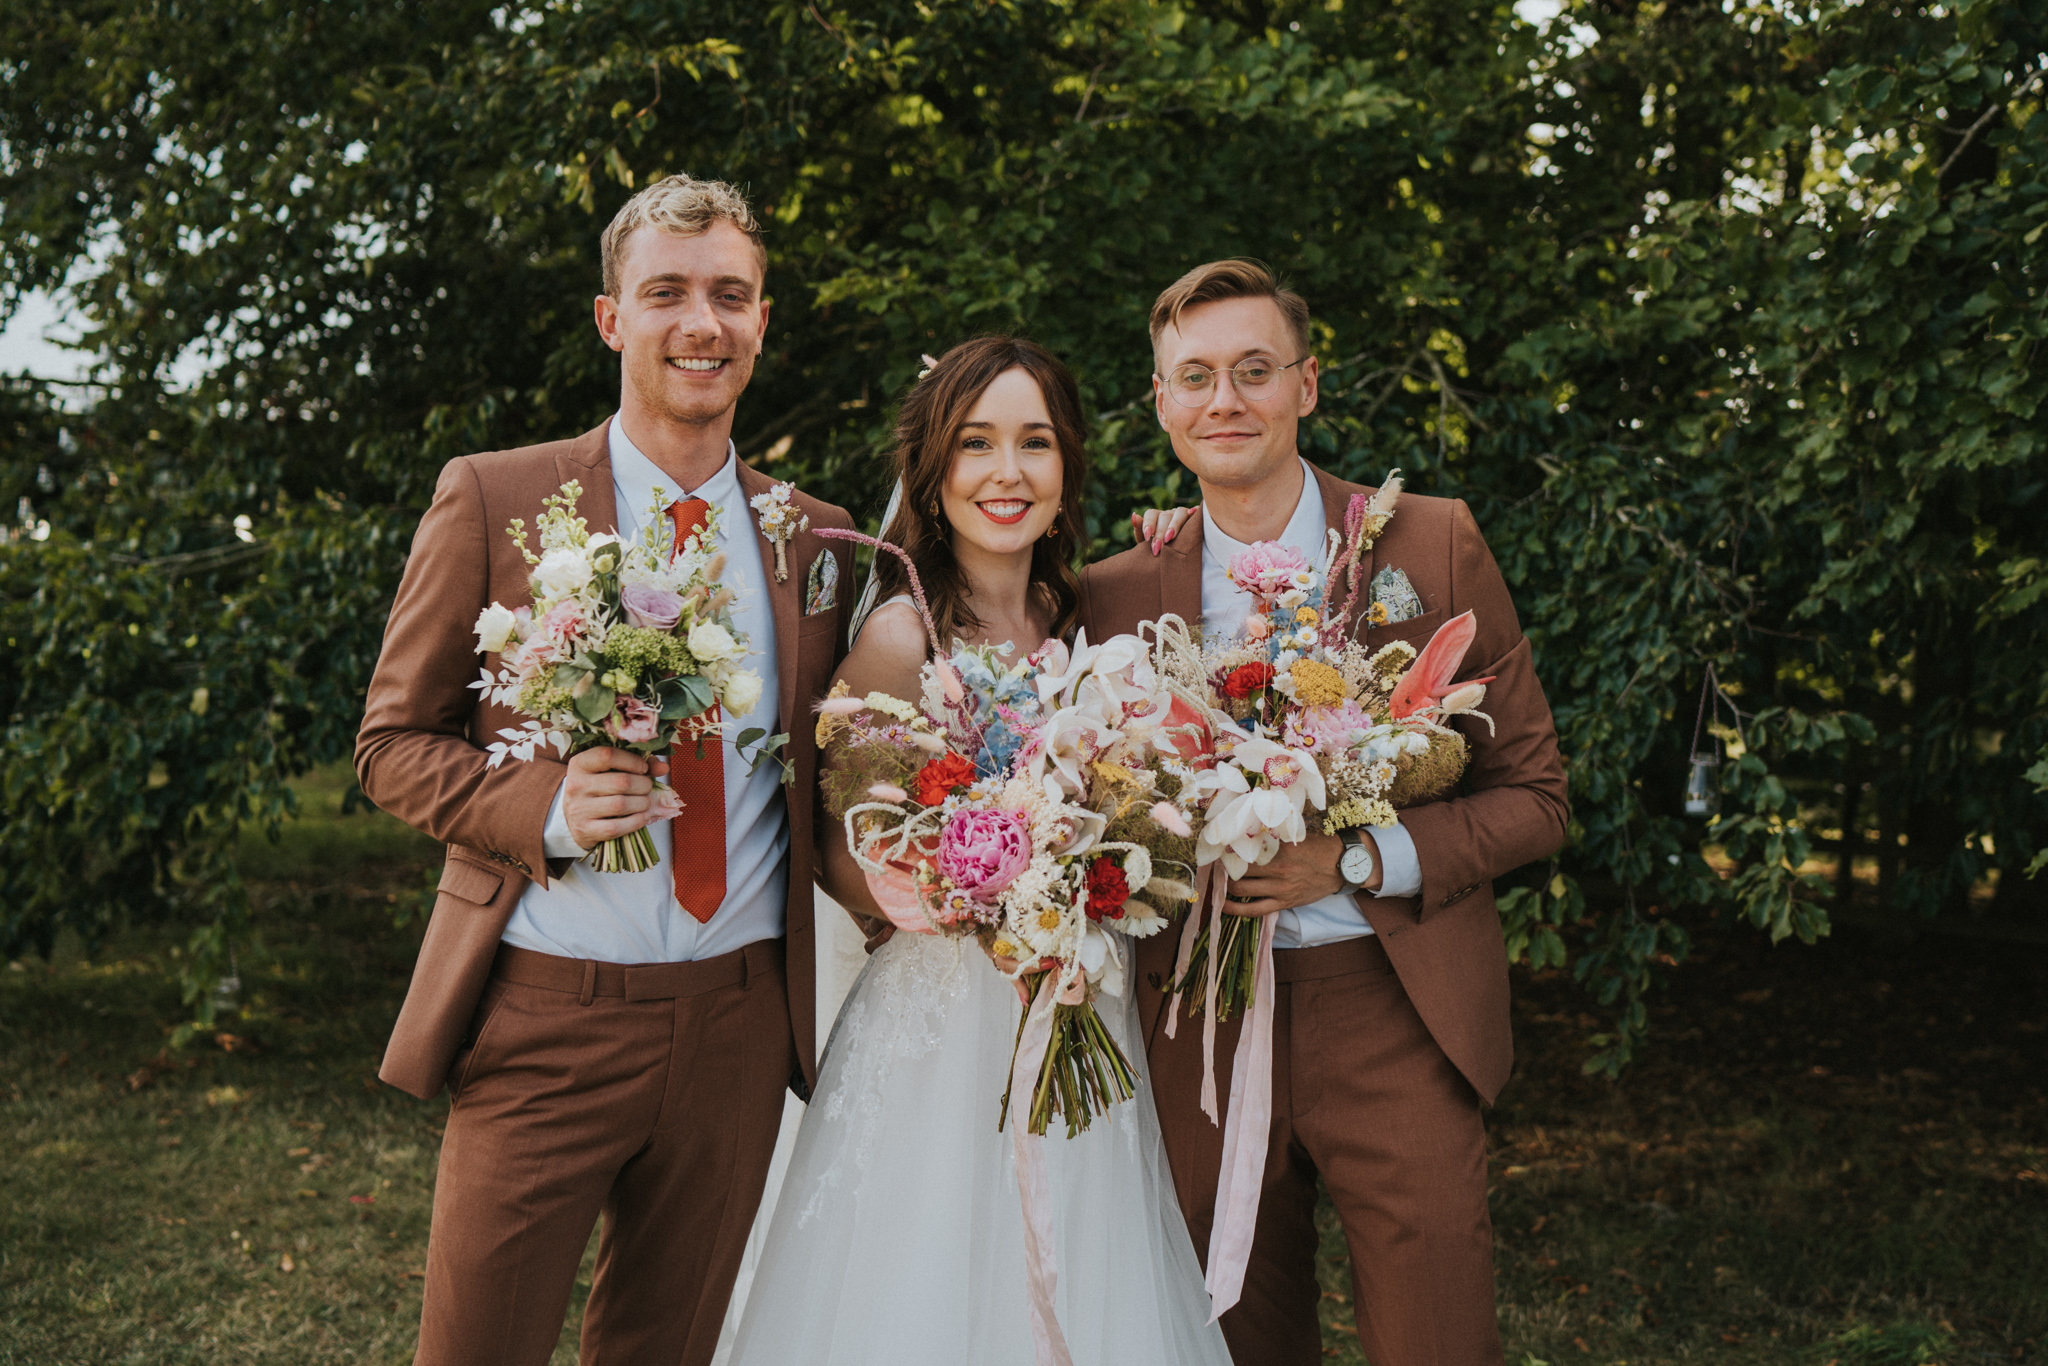 emi-Jack-boho-diy-wedding-eggington-house-grace-elizabeth-colchester-essex-alternative-wedding-photographer-suffolk-norfolk-devon (28 of 56).jpg